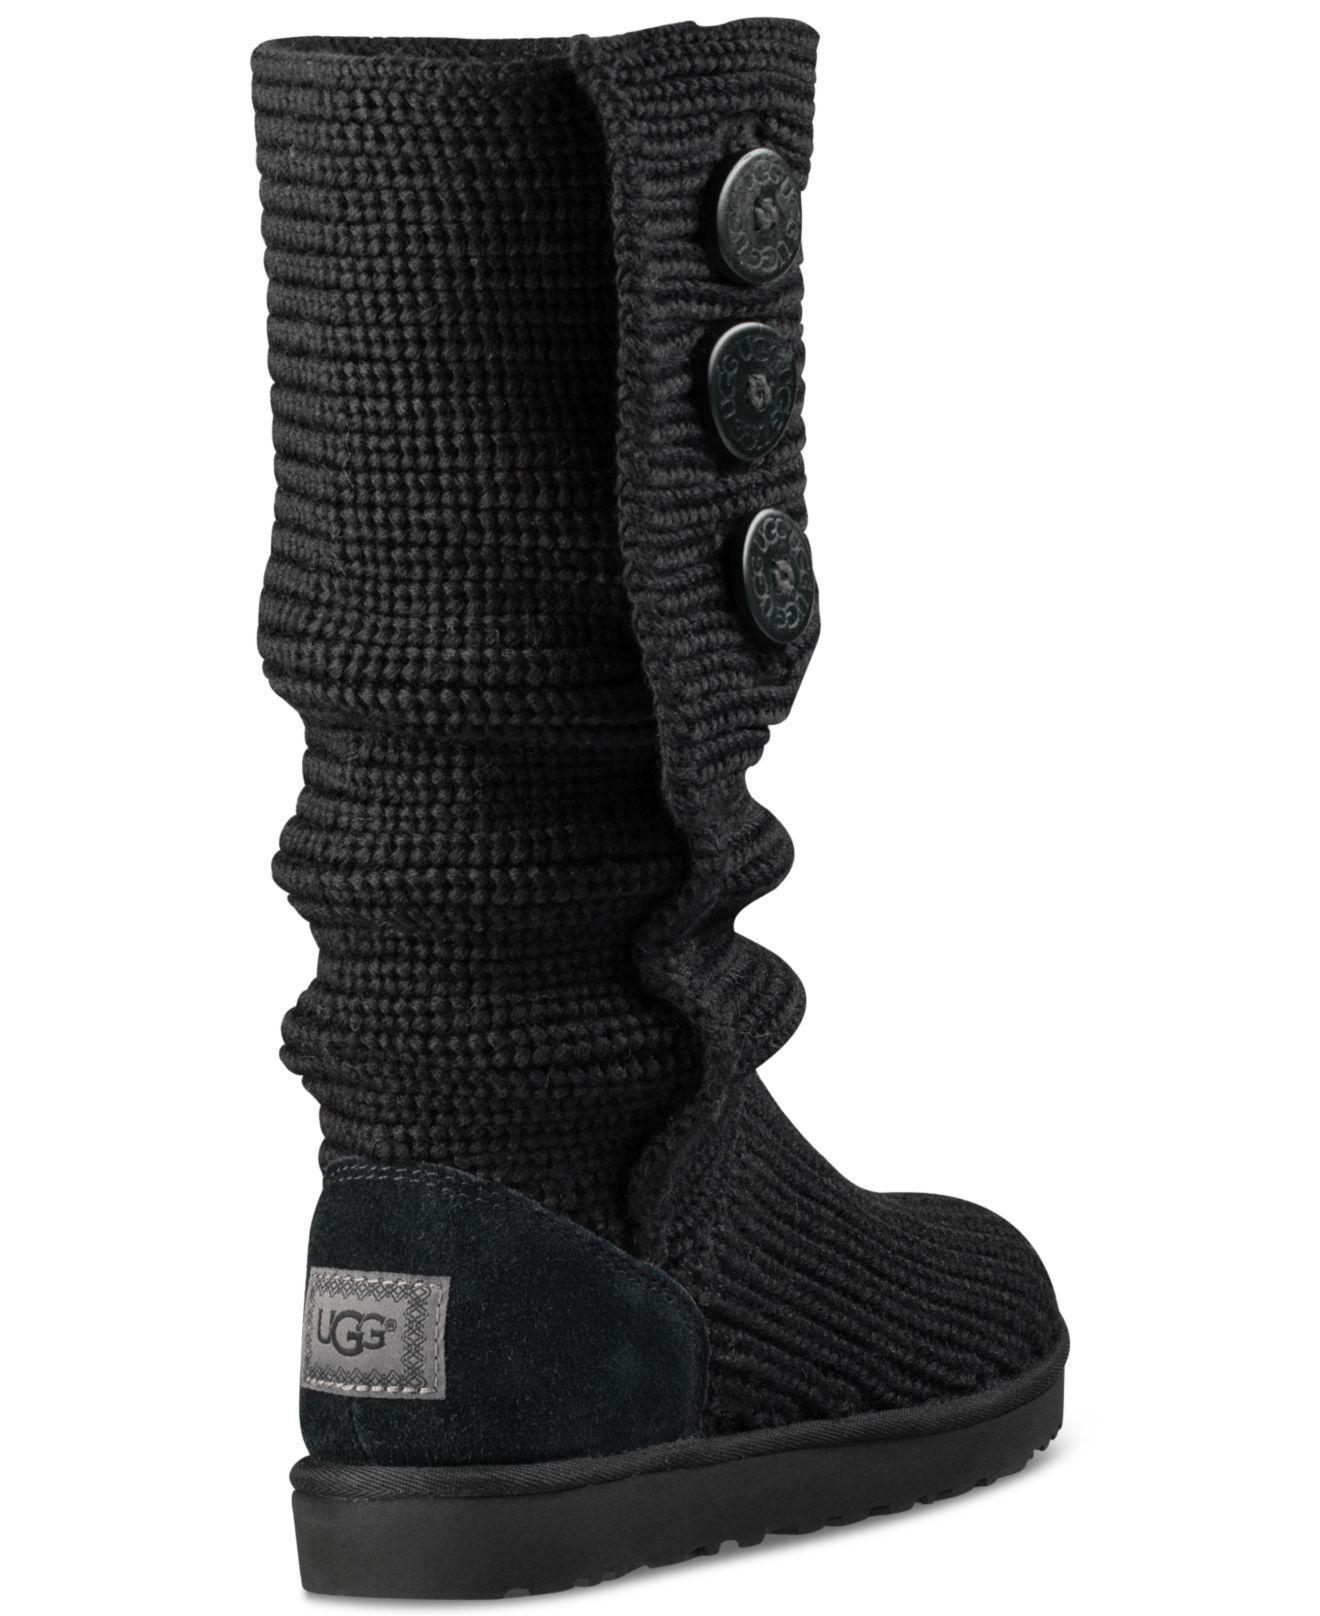 382846e7794 Women's Black Classic Cardy Boots